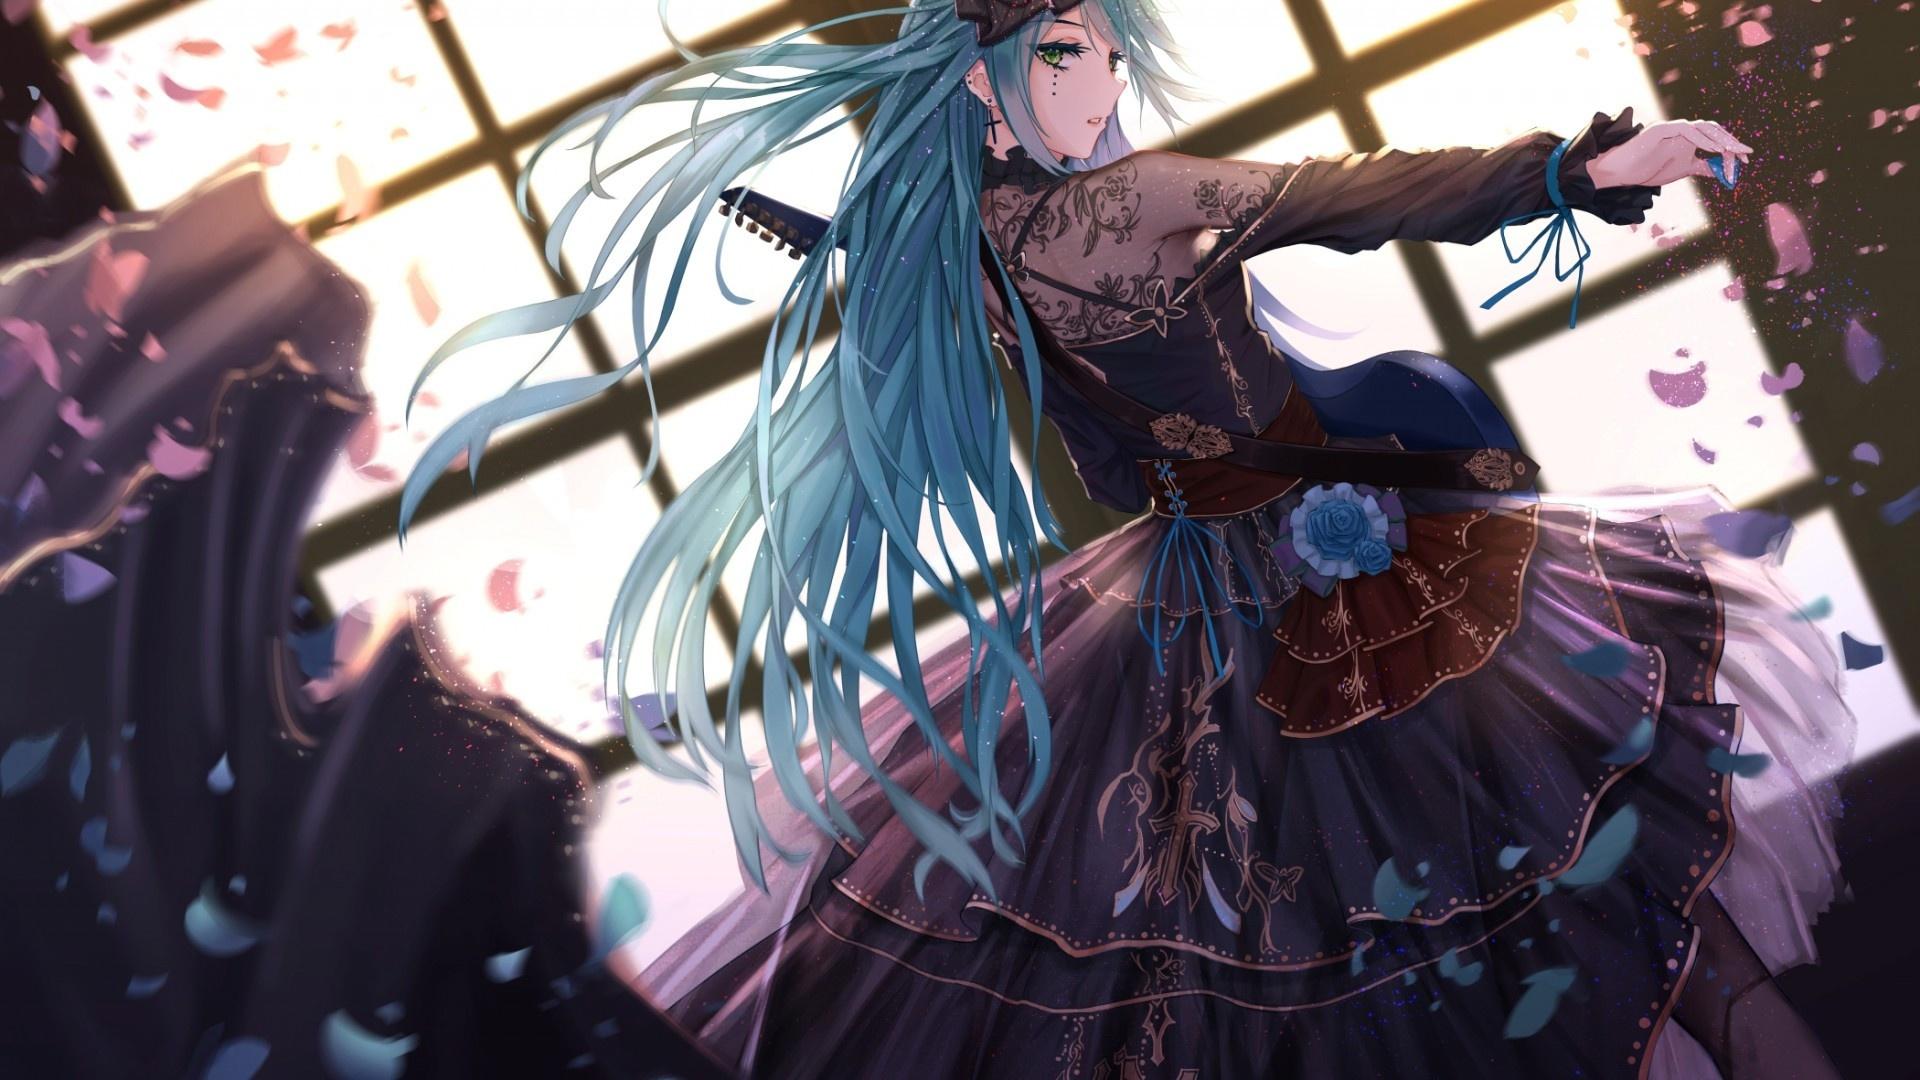 Anime Gothic Girl pc wallpaper